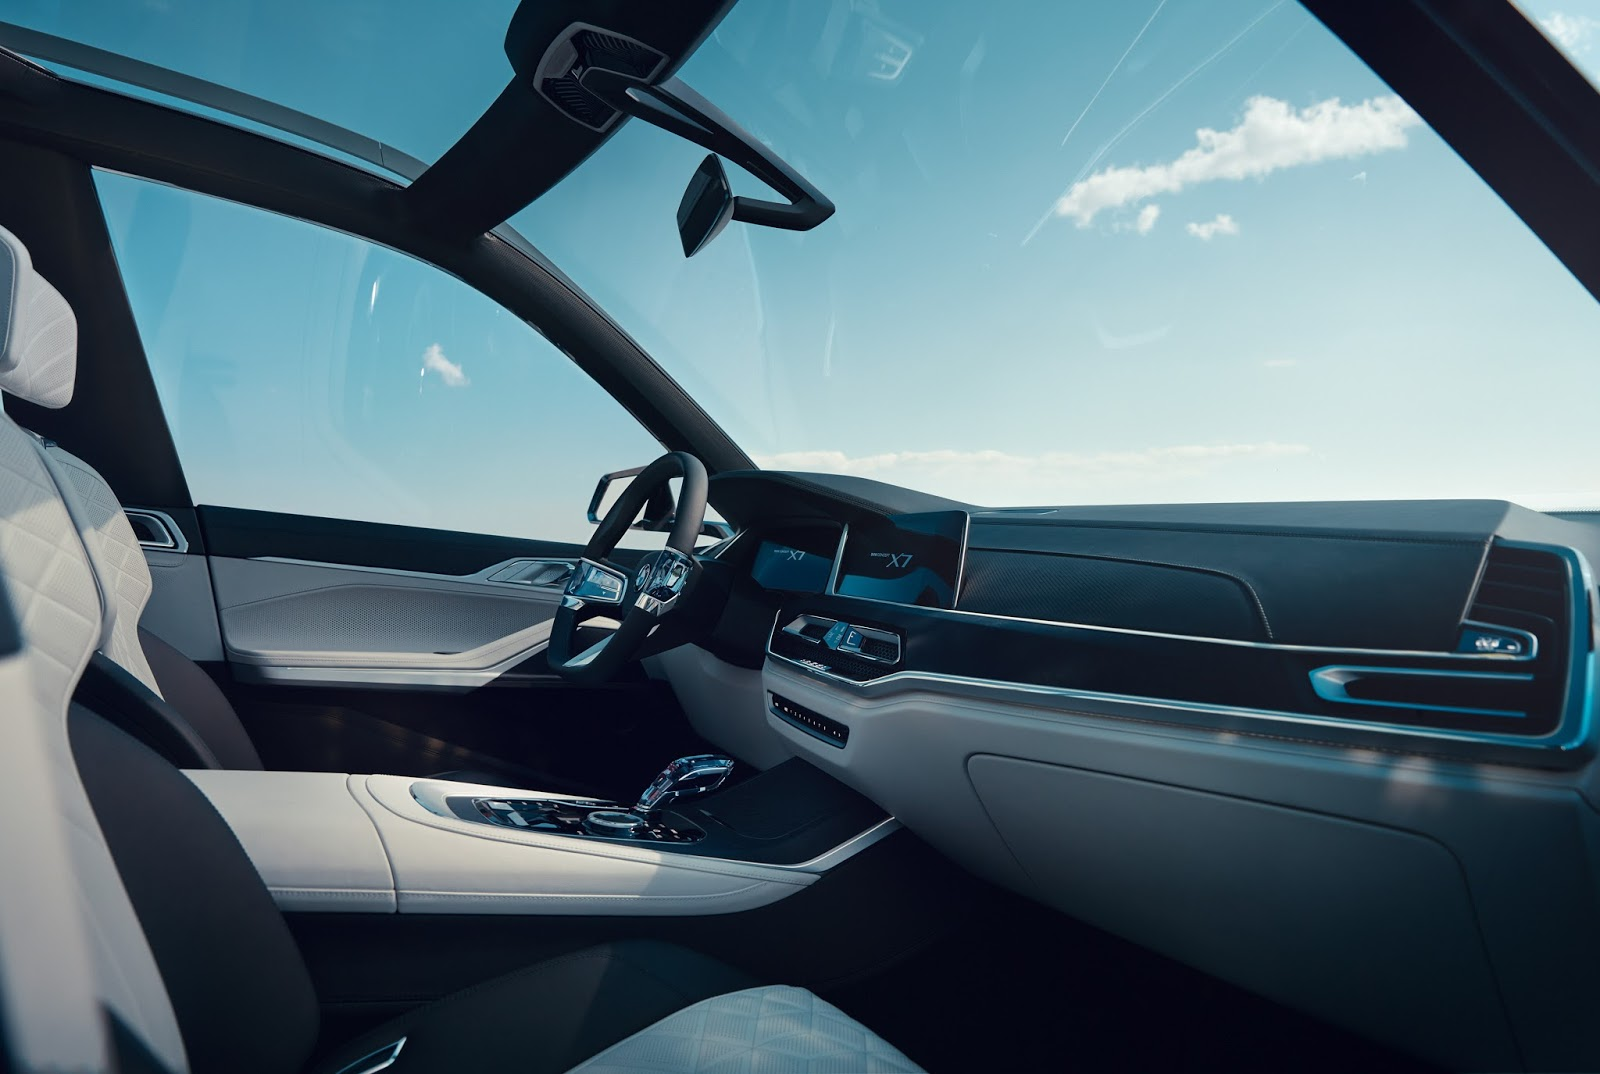 BMW-X7-iPerfomance-Concept-6.jpeg